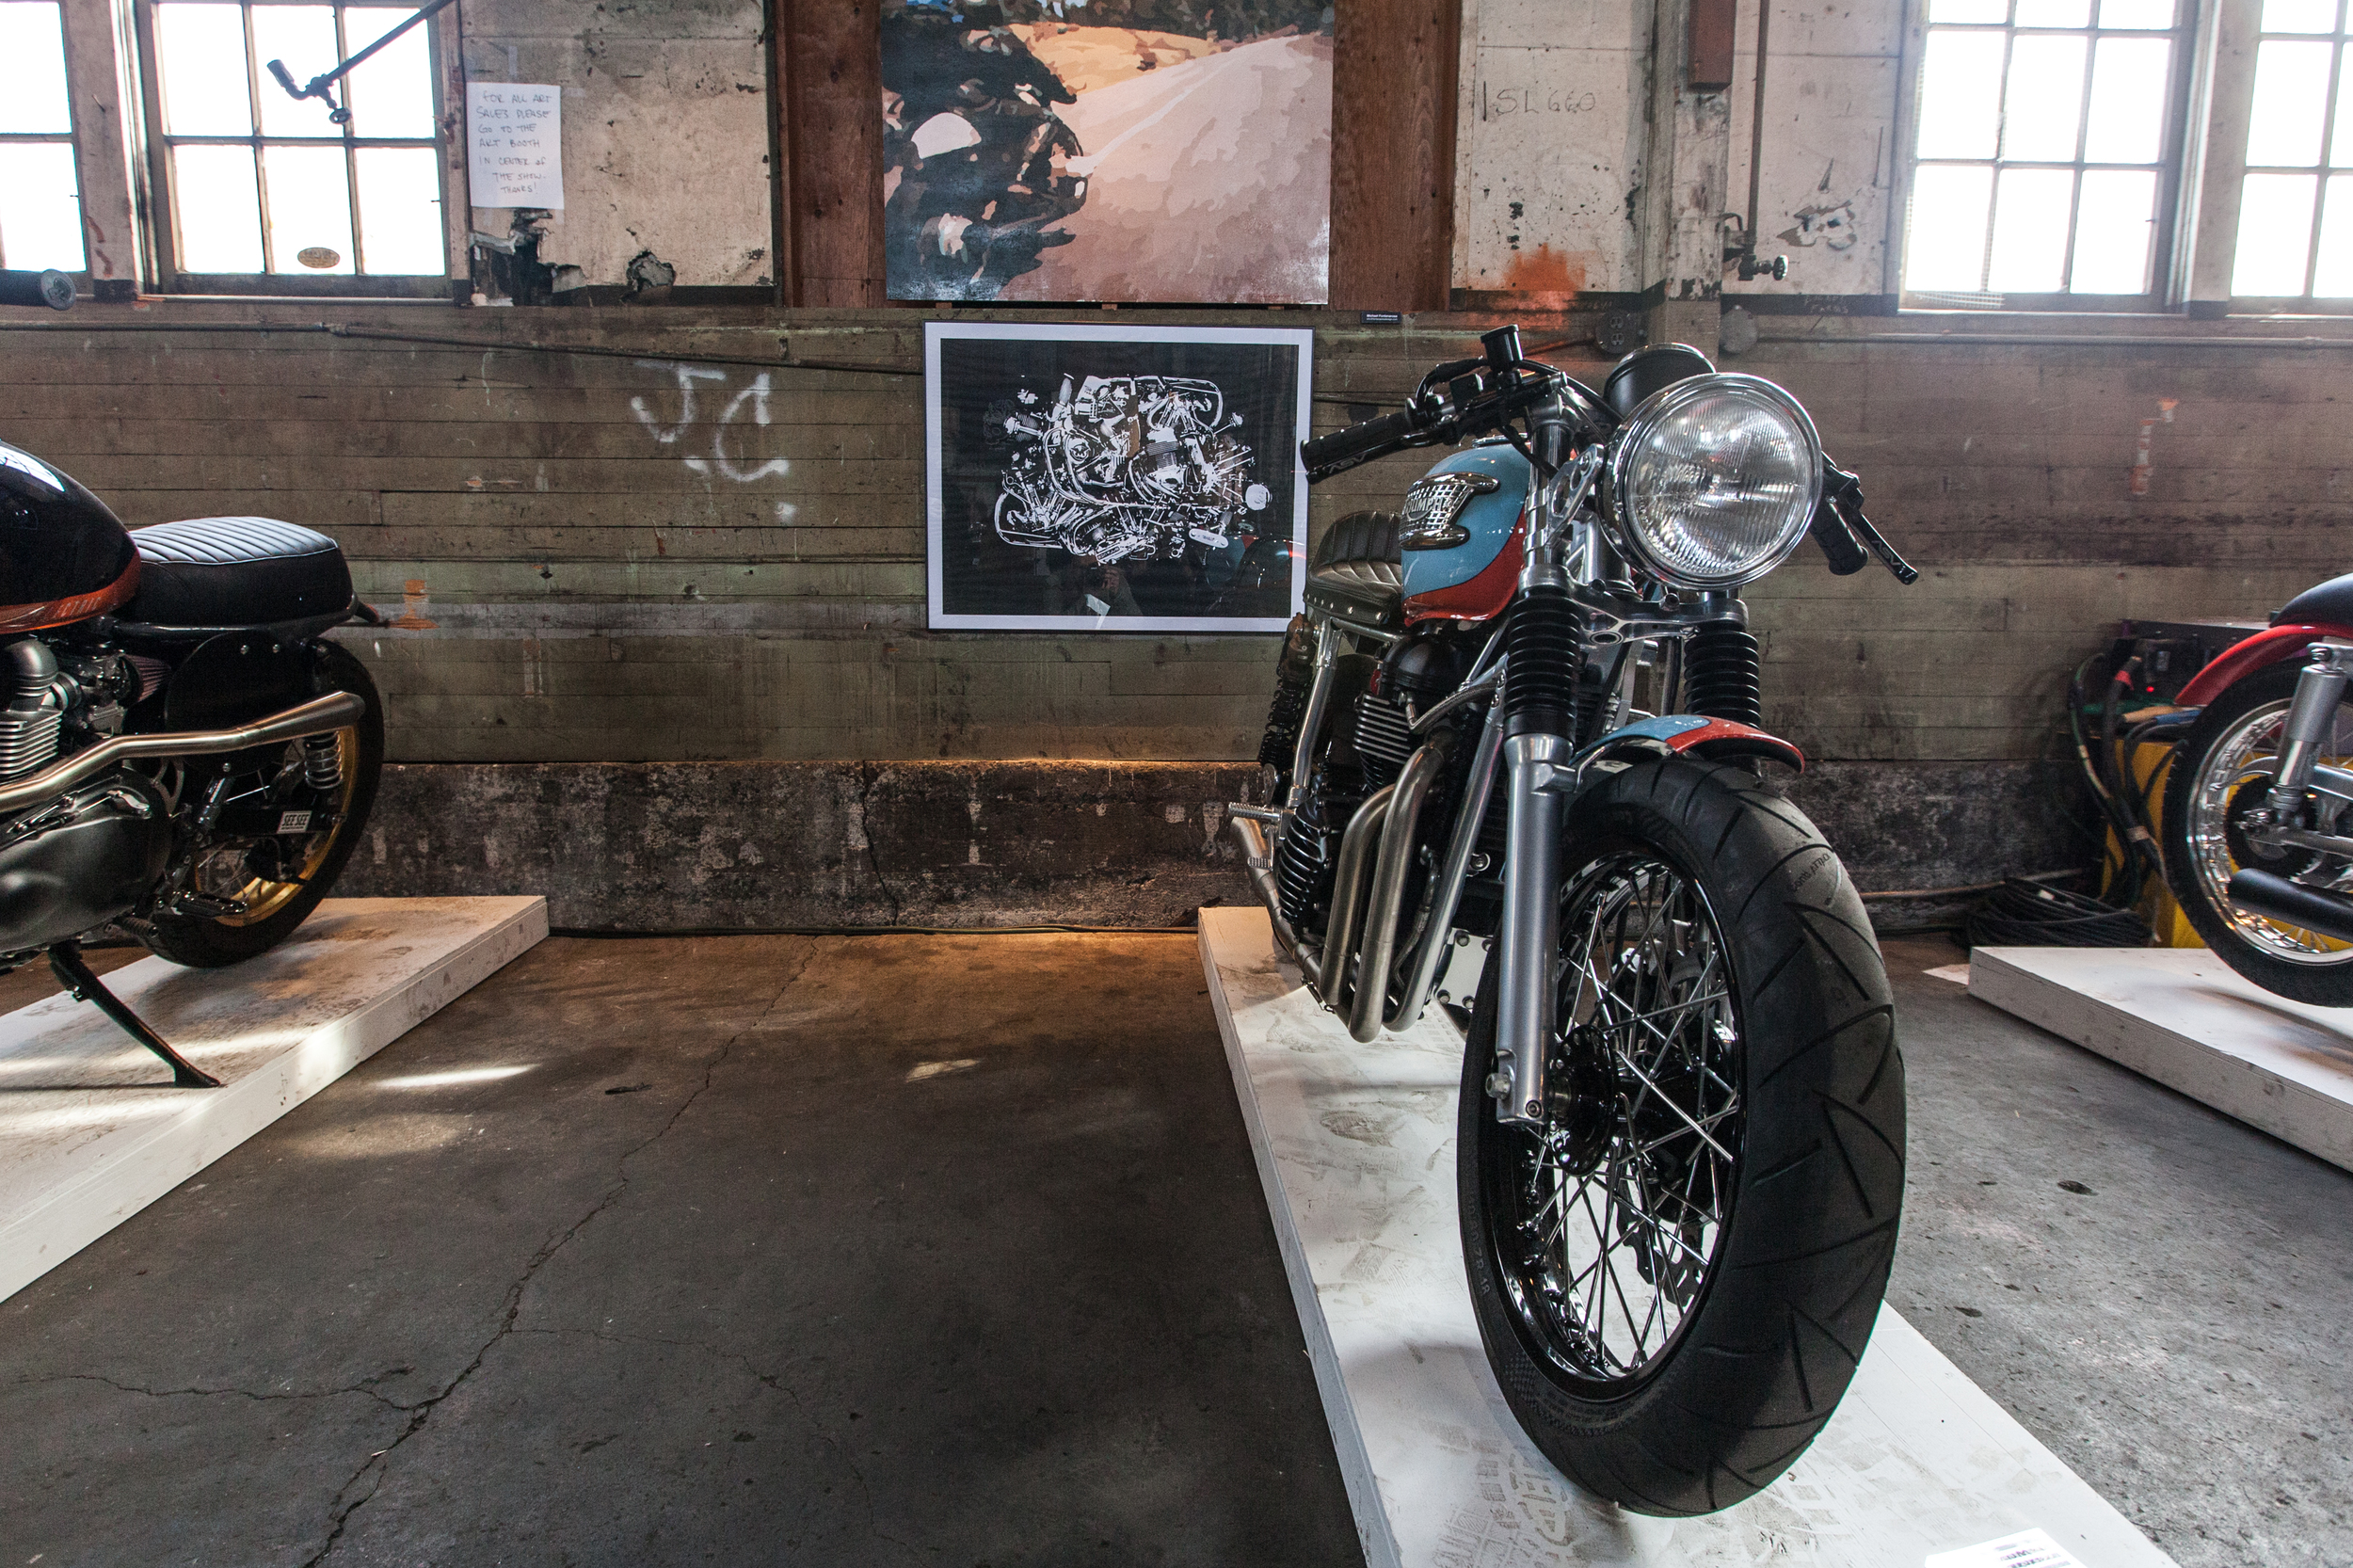 02-14-15 The 1 Moto Show - 4-8-3.jpg